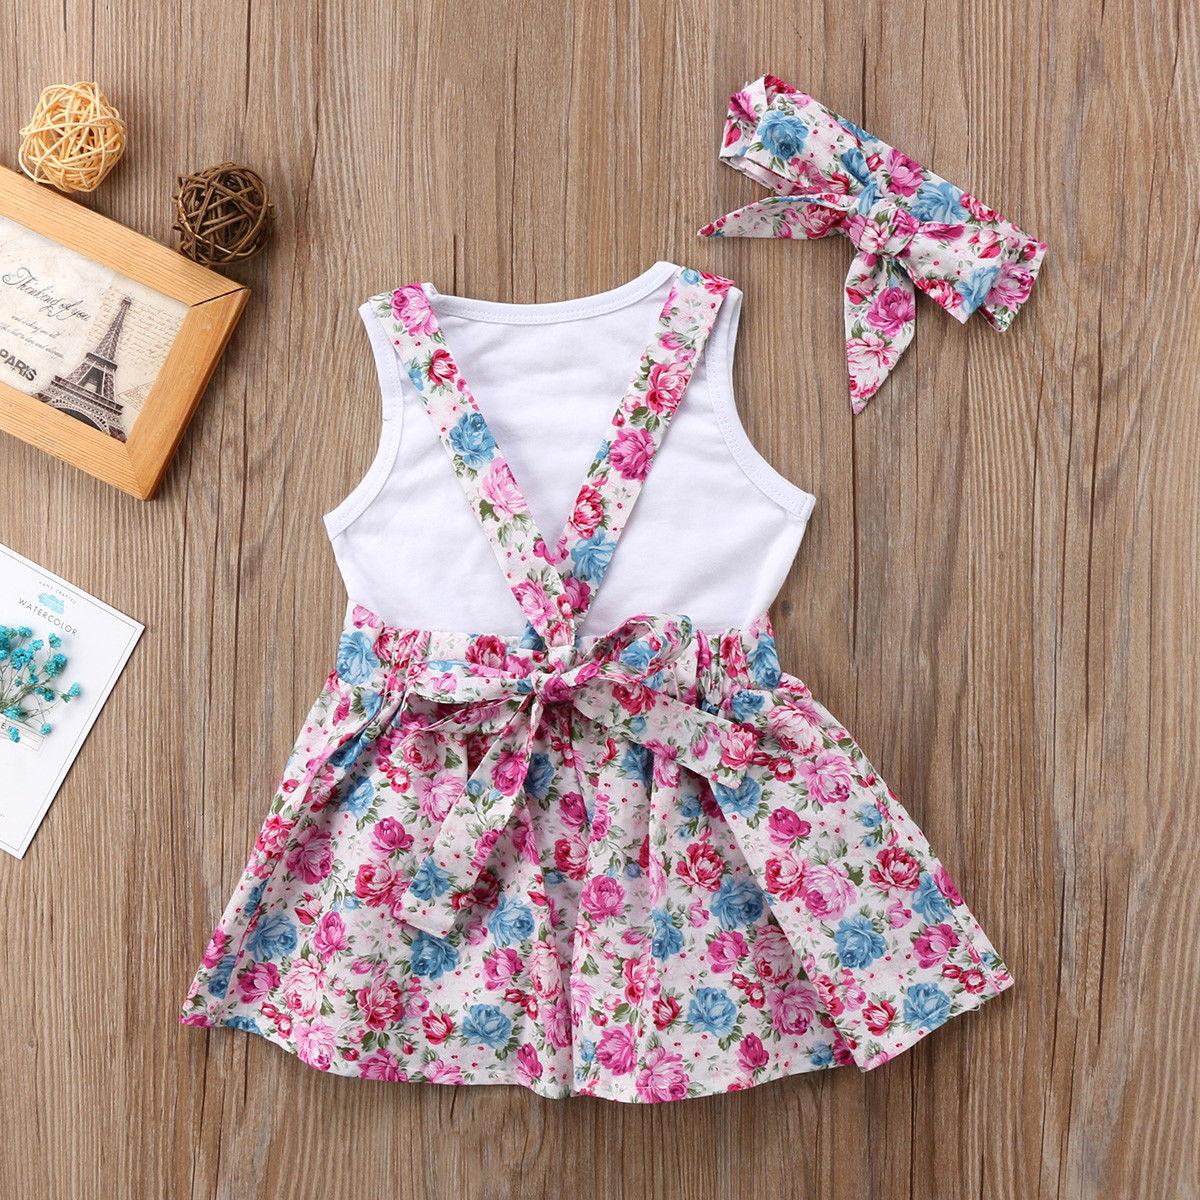 2018 Brand New Newborn Toddler Baby Kid Girl Sister Matching Cotton